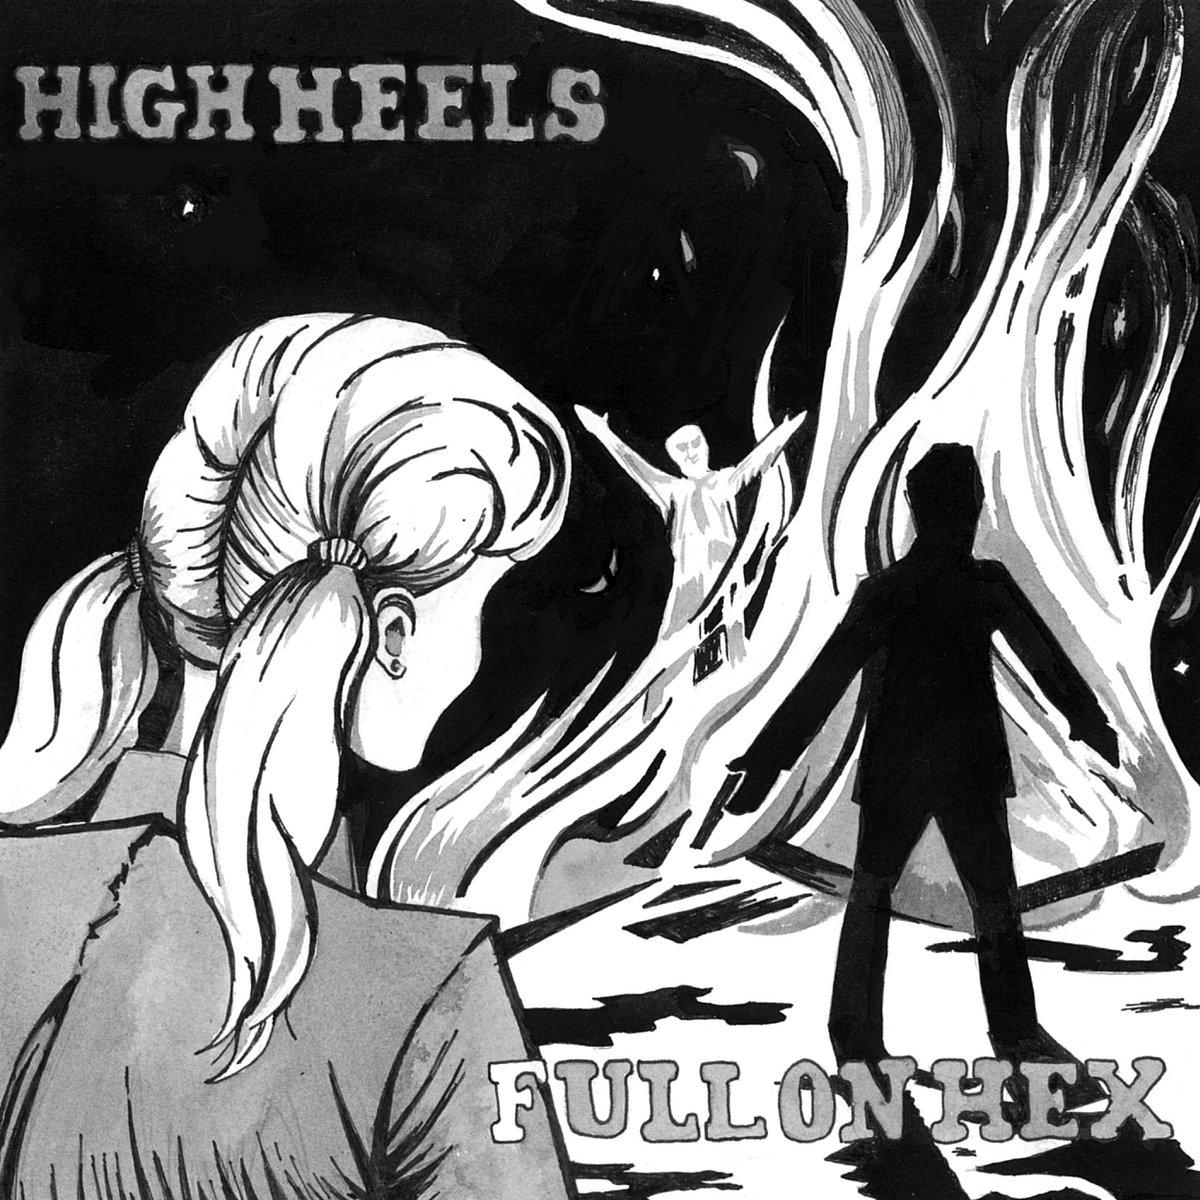 High heels down dick